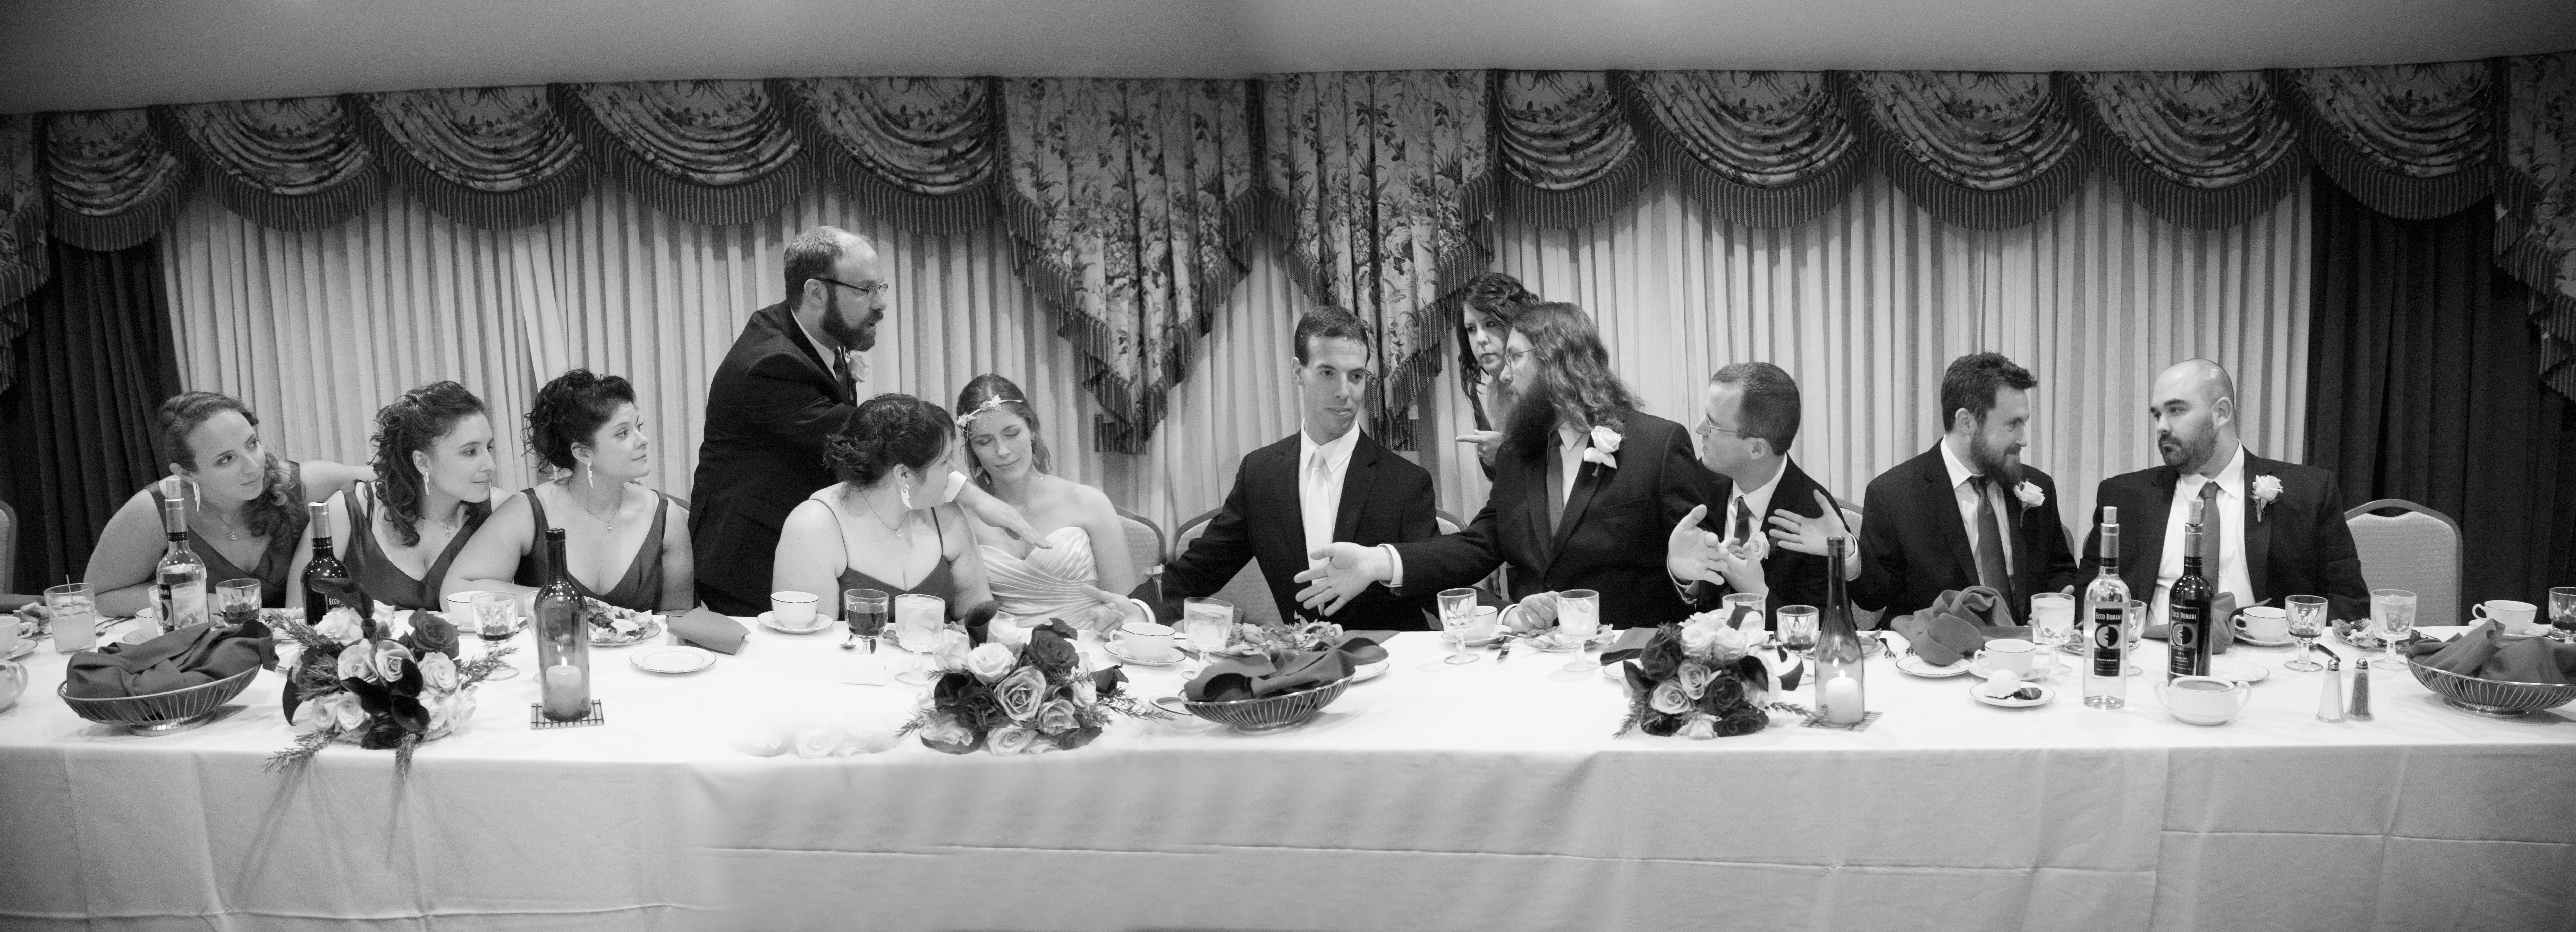 2014-04-17-amymaelastsupperwedding417.jpg